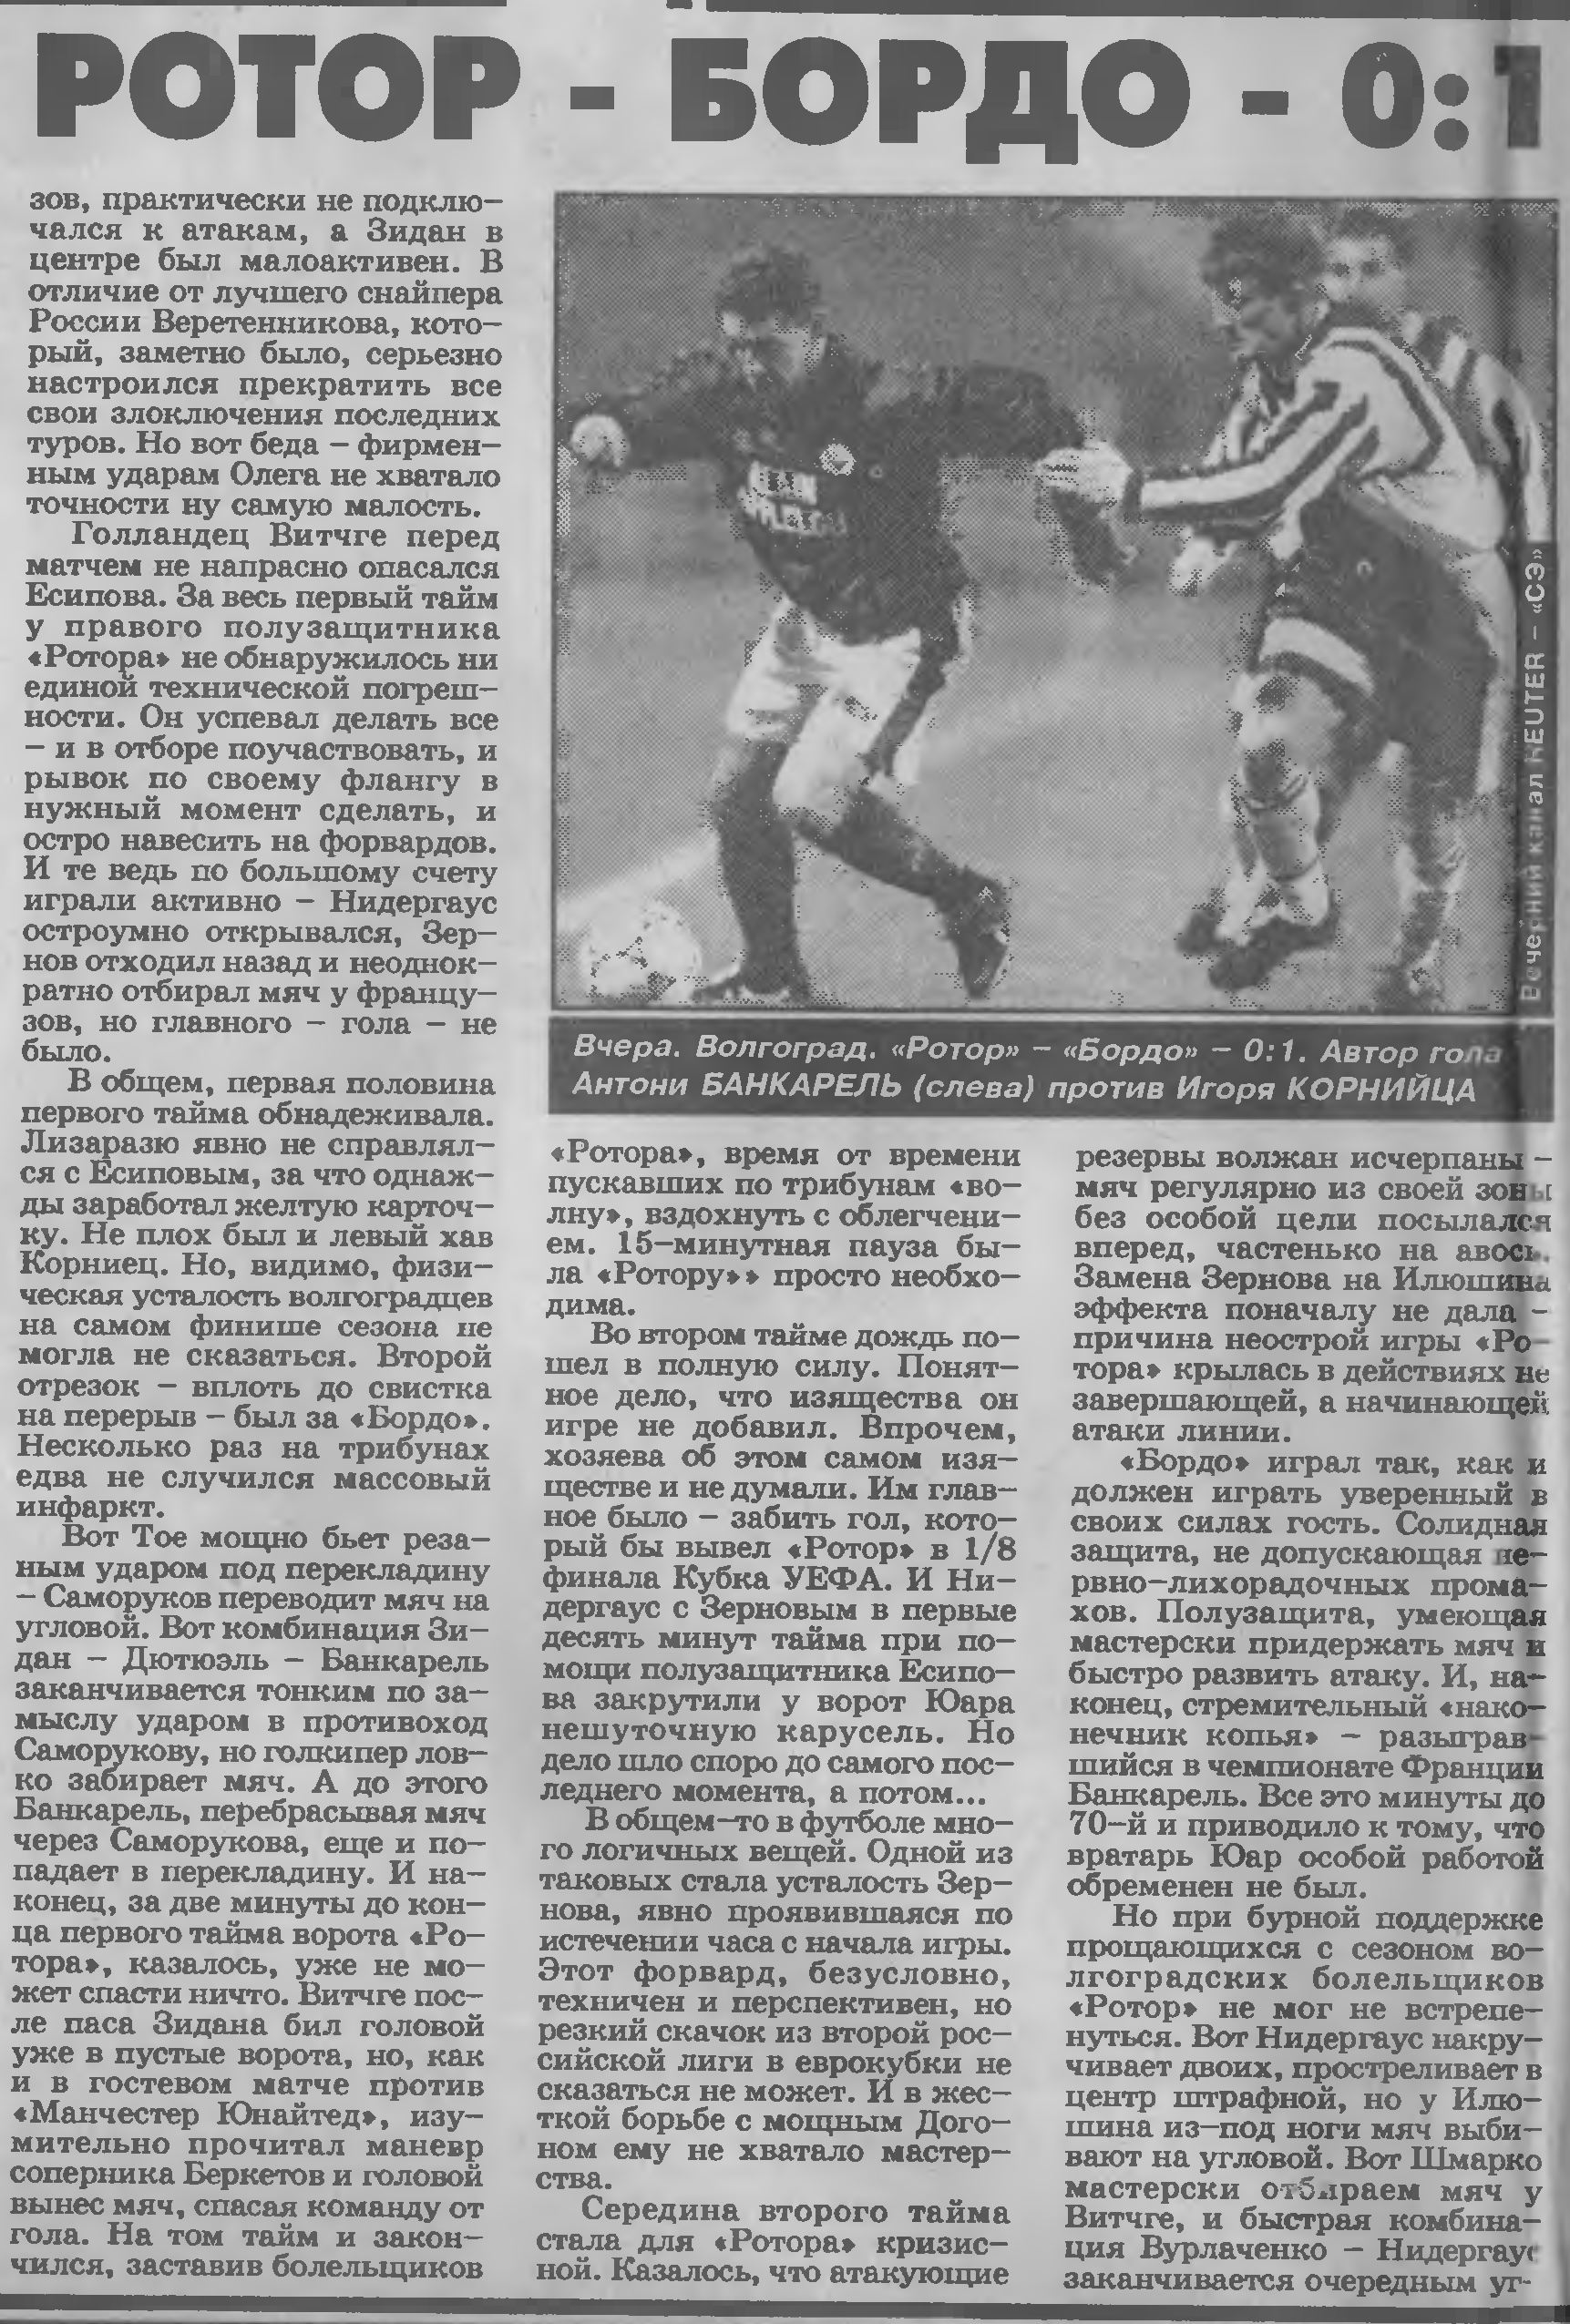 Ротор (Россия) - Бордо (Франция) 0:1